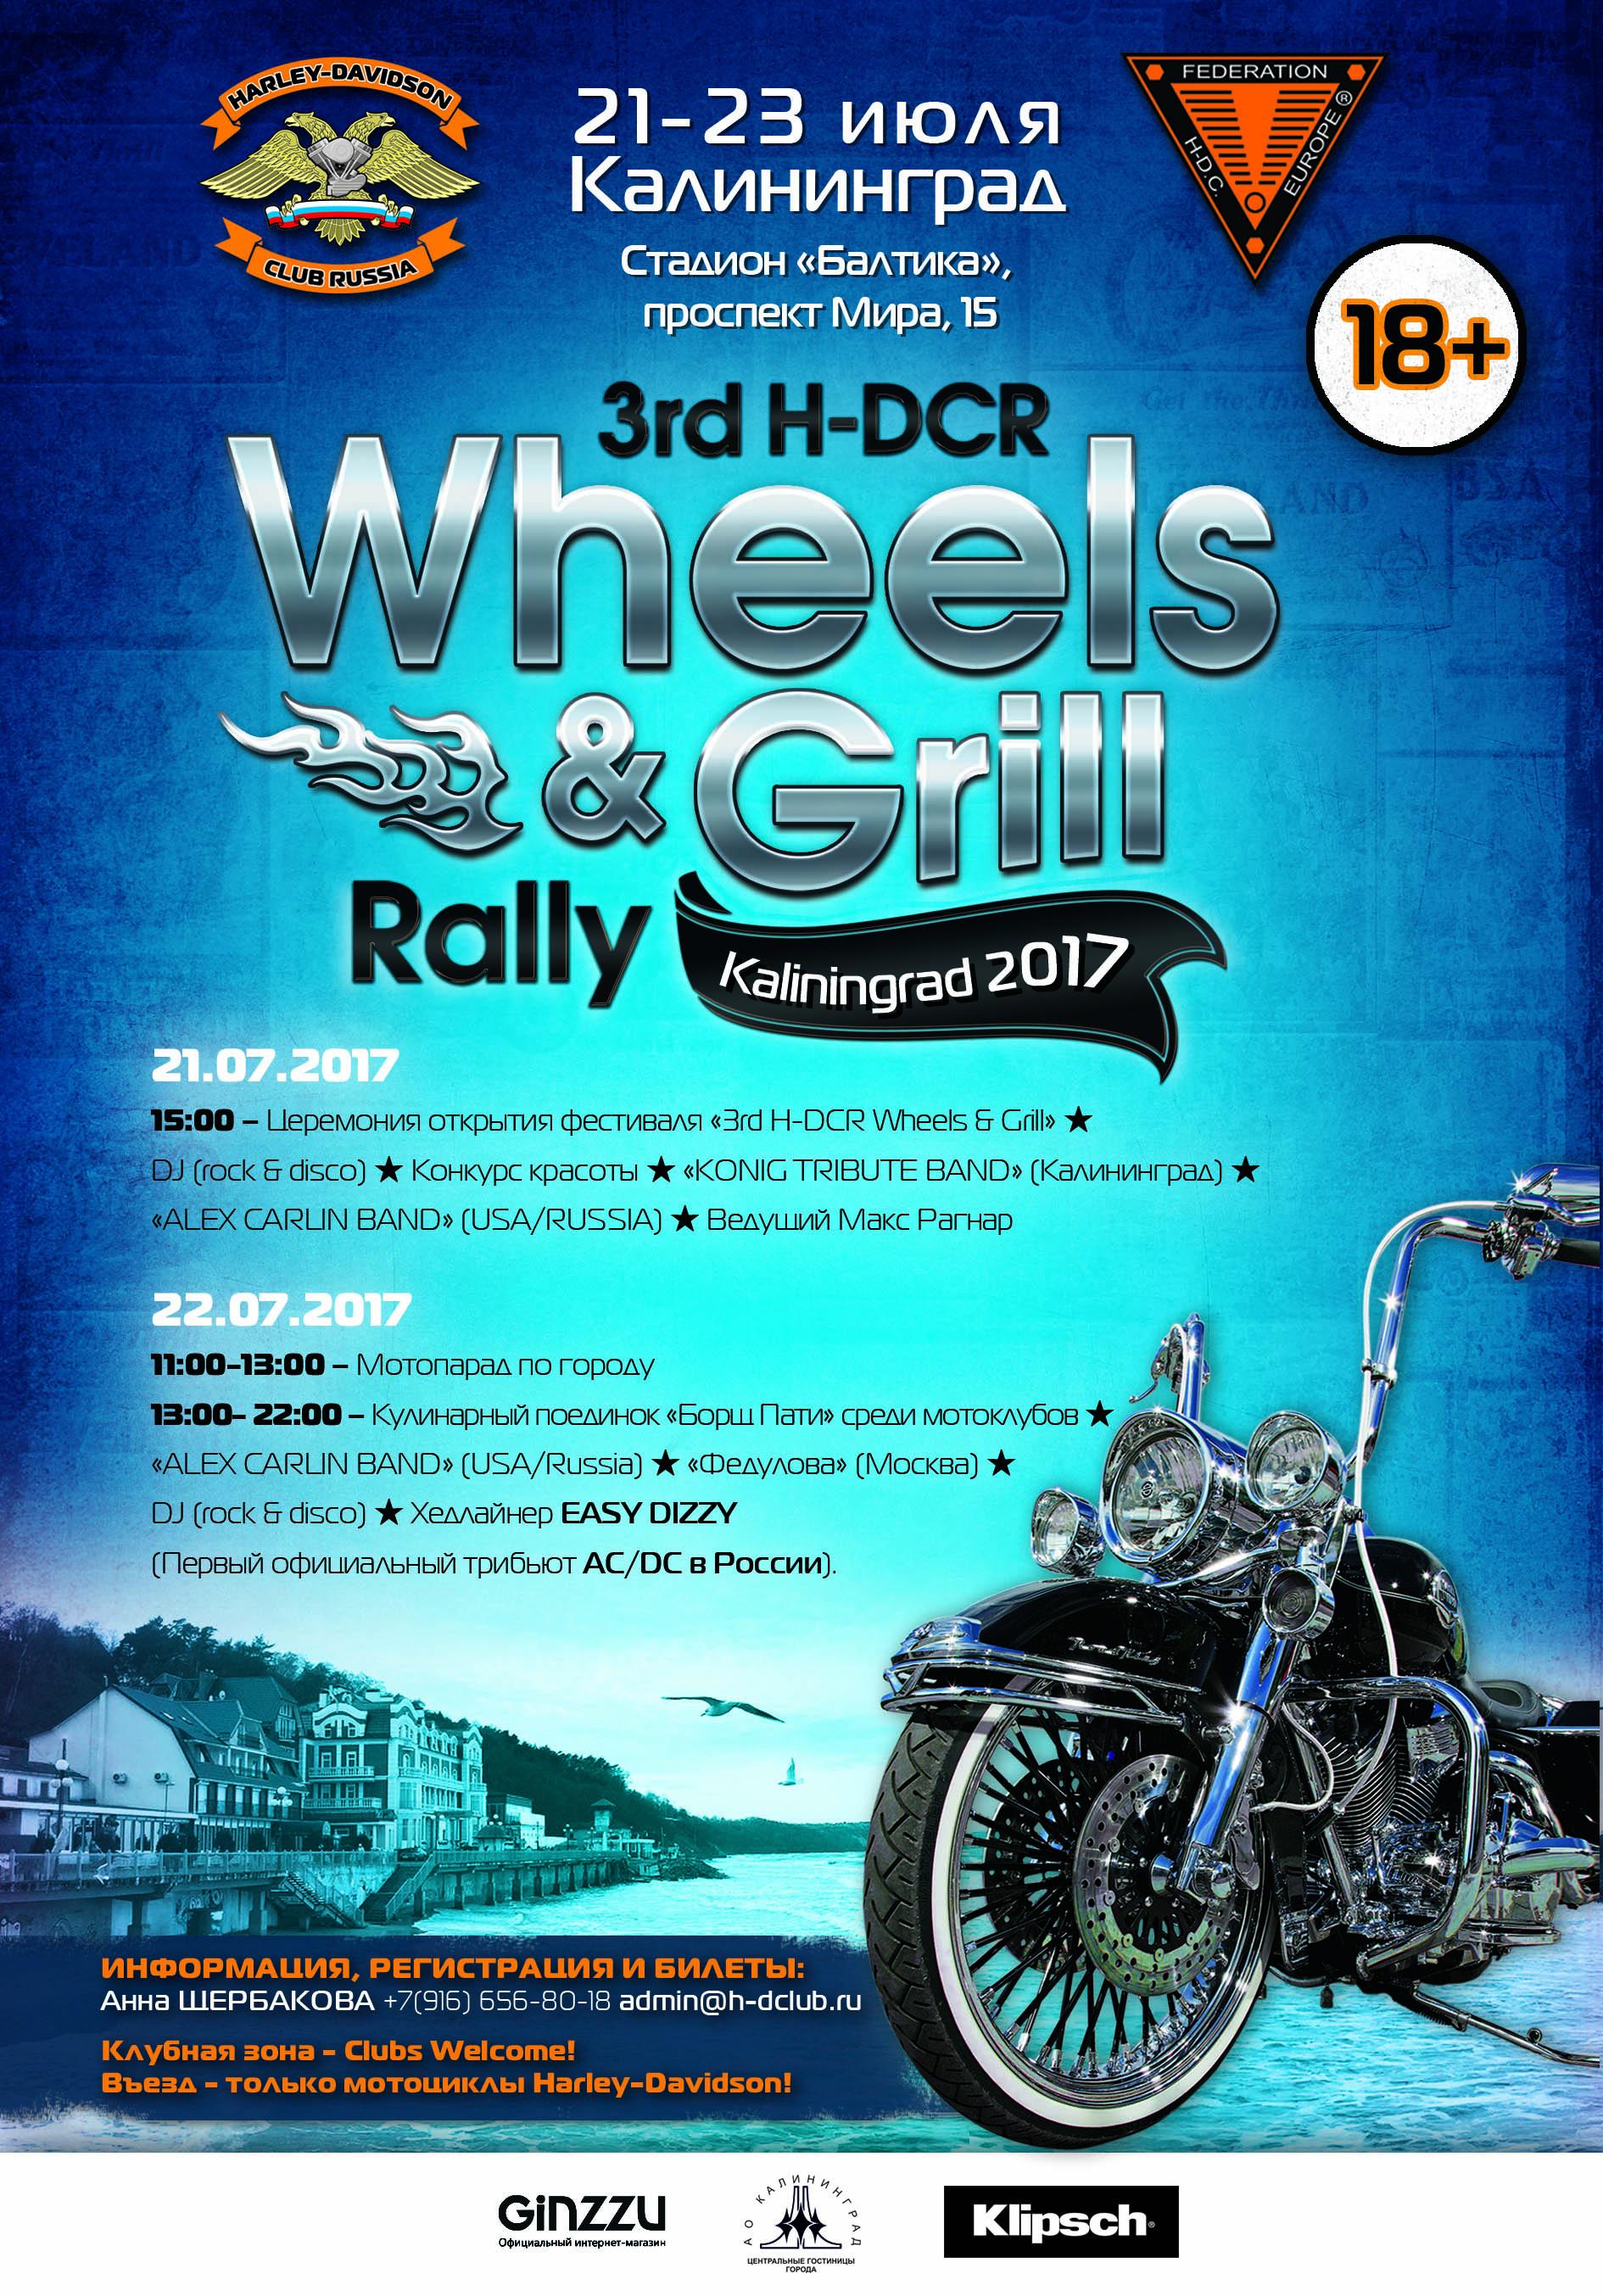 21-23 июля Wheels&Grill Rally